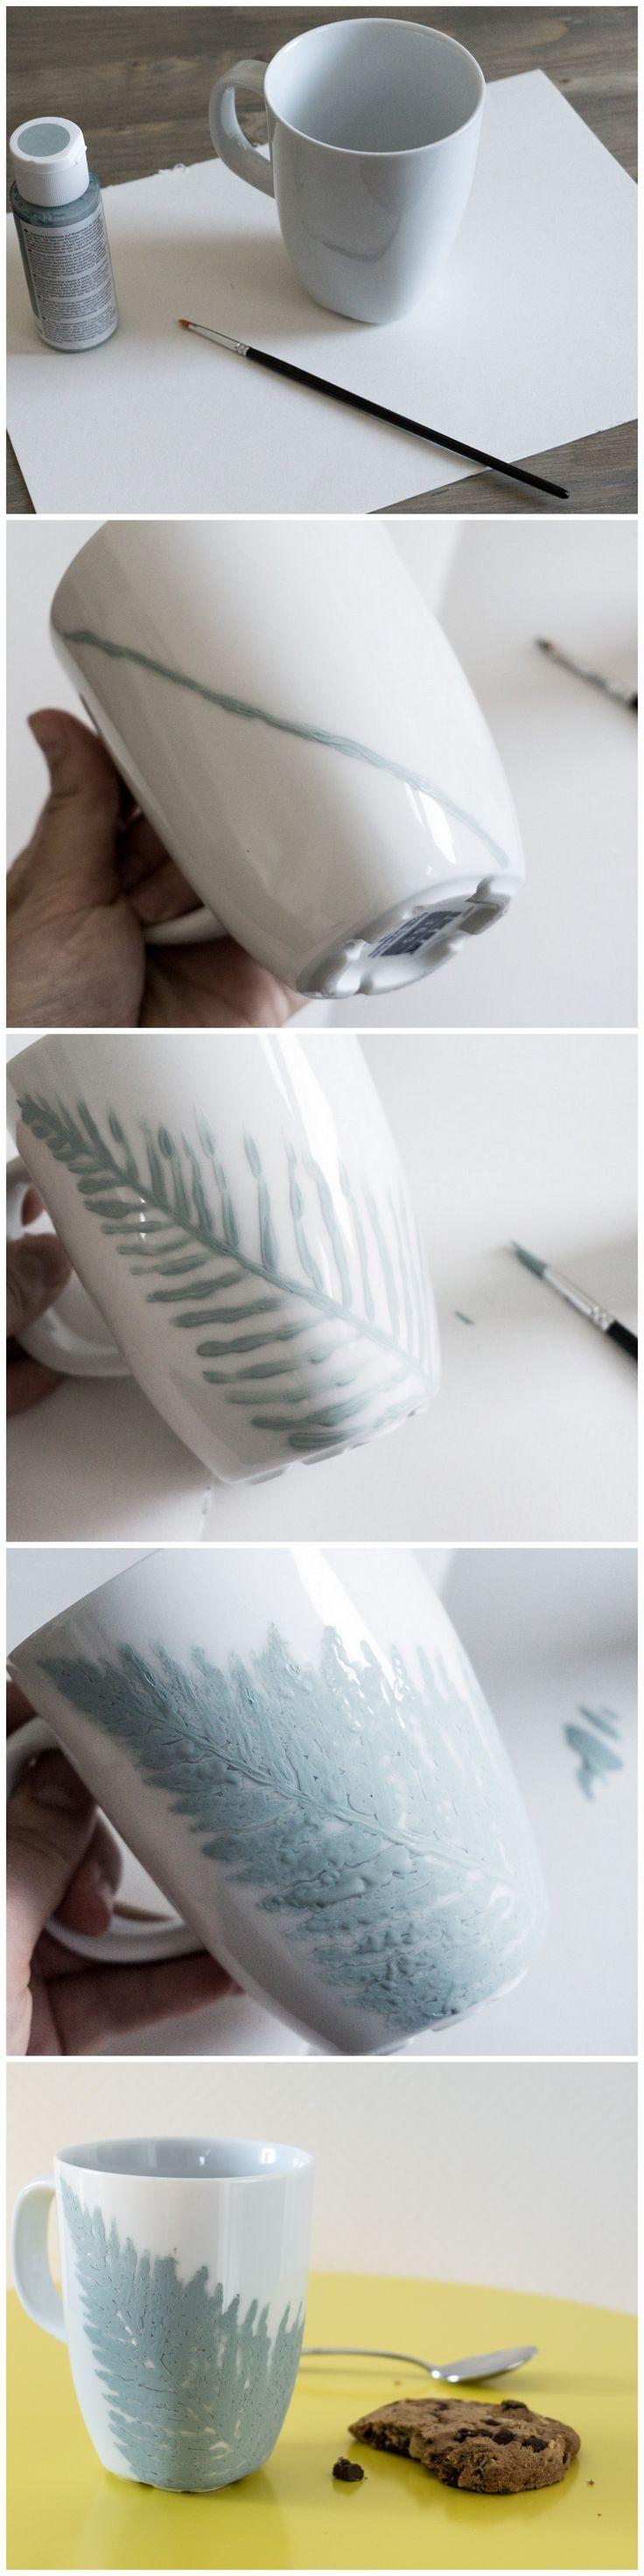 DIY mug with a fern frond made of mintgreen chalk paint | DIY Kreidefarbe Tasse mit floralem Farn Motiv